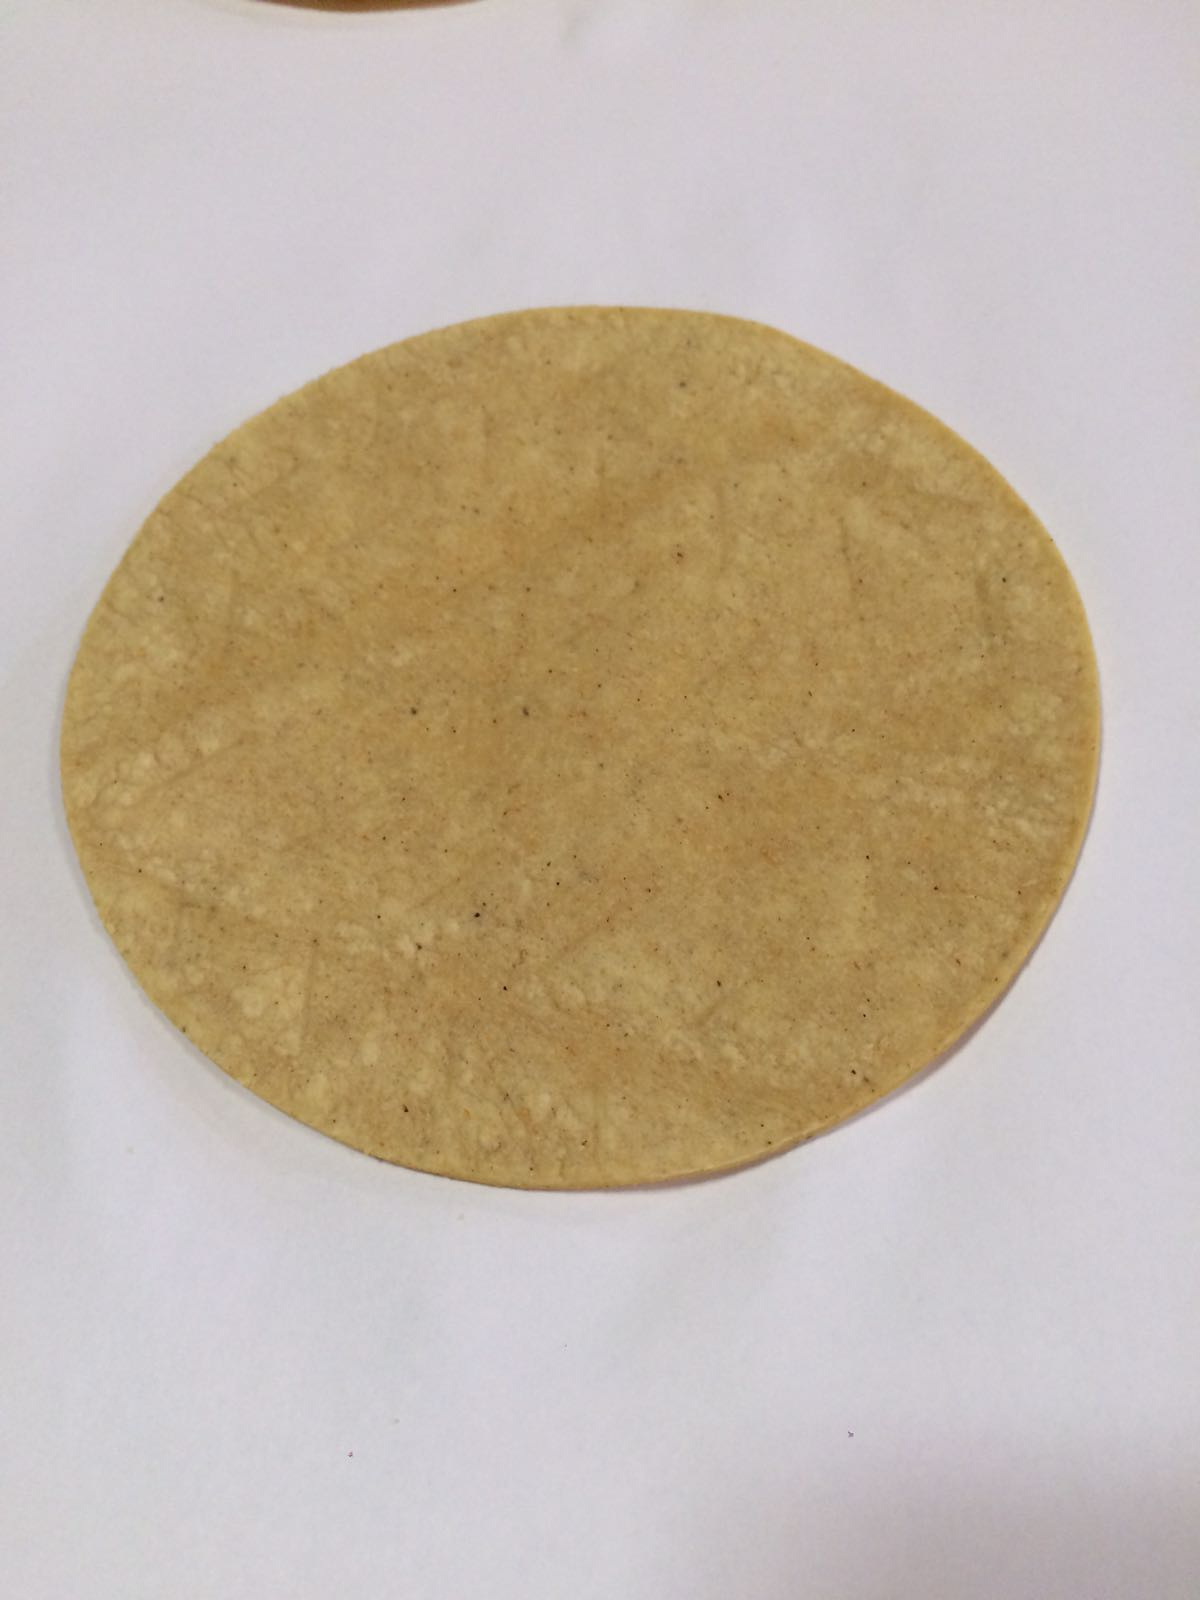 Tortilla prehispanica